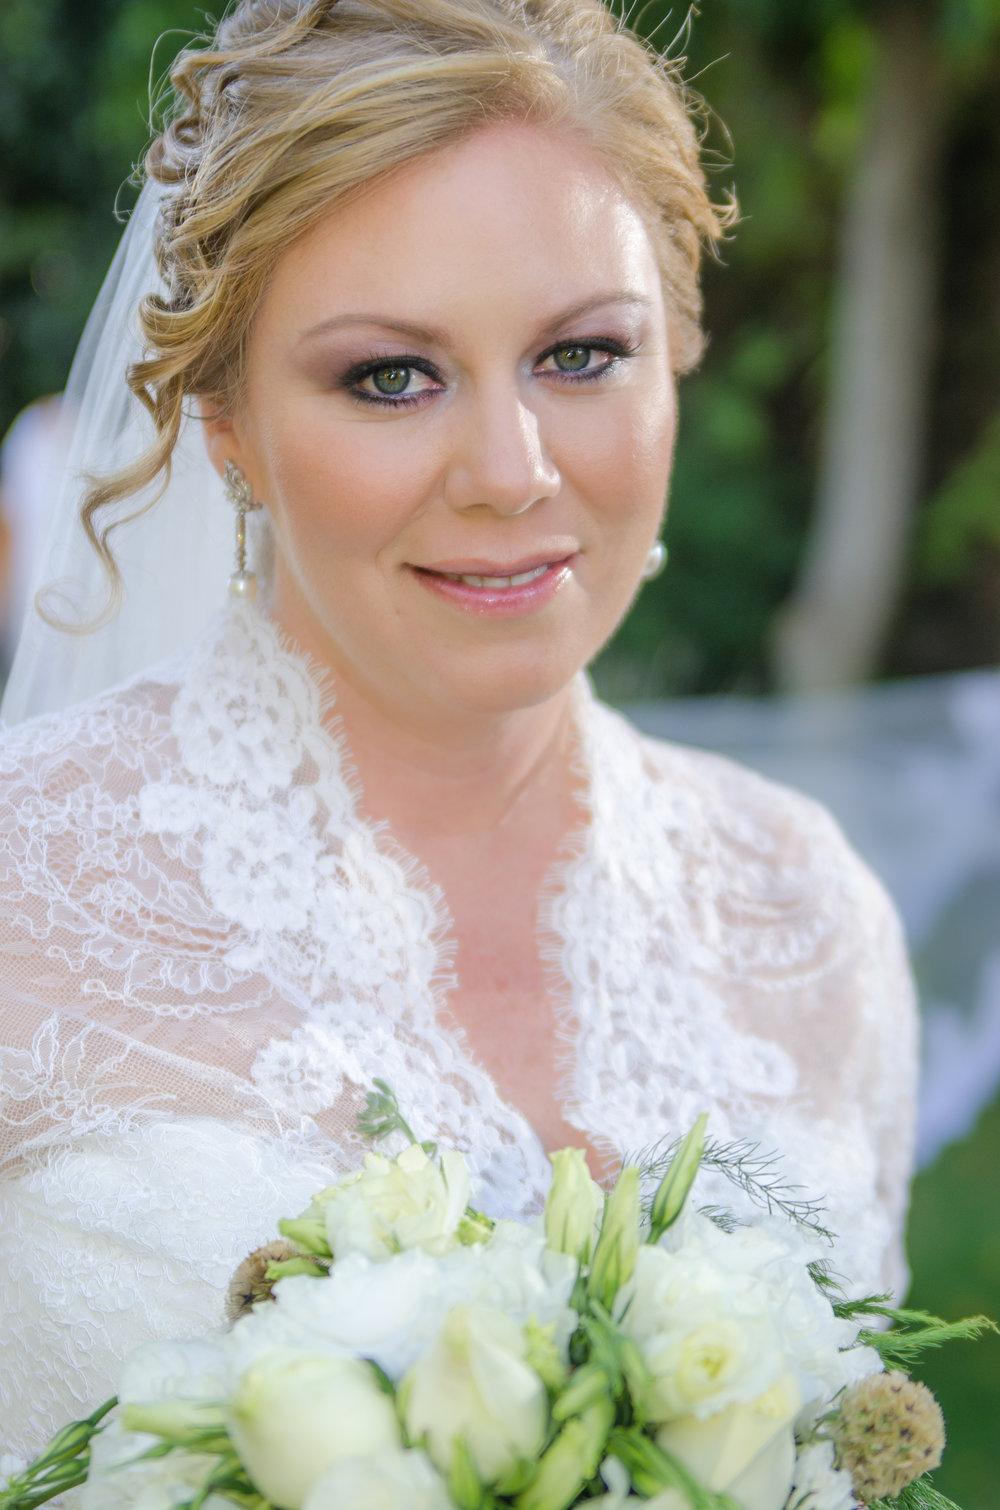 white dress, white bouquet, green eyes